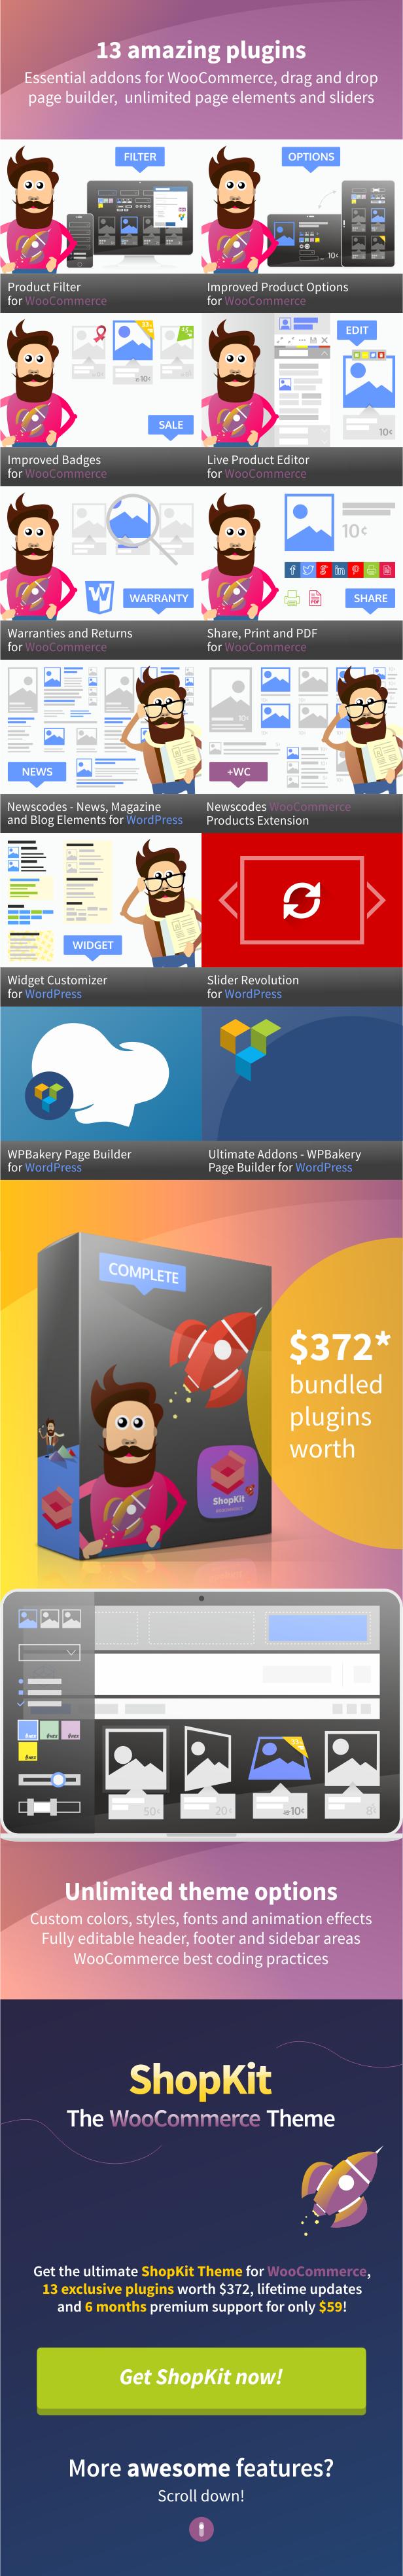 ShopKit - The WooCommerce Theme - 28